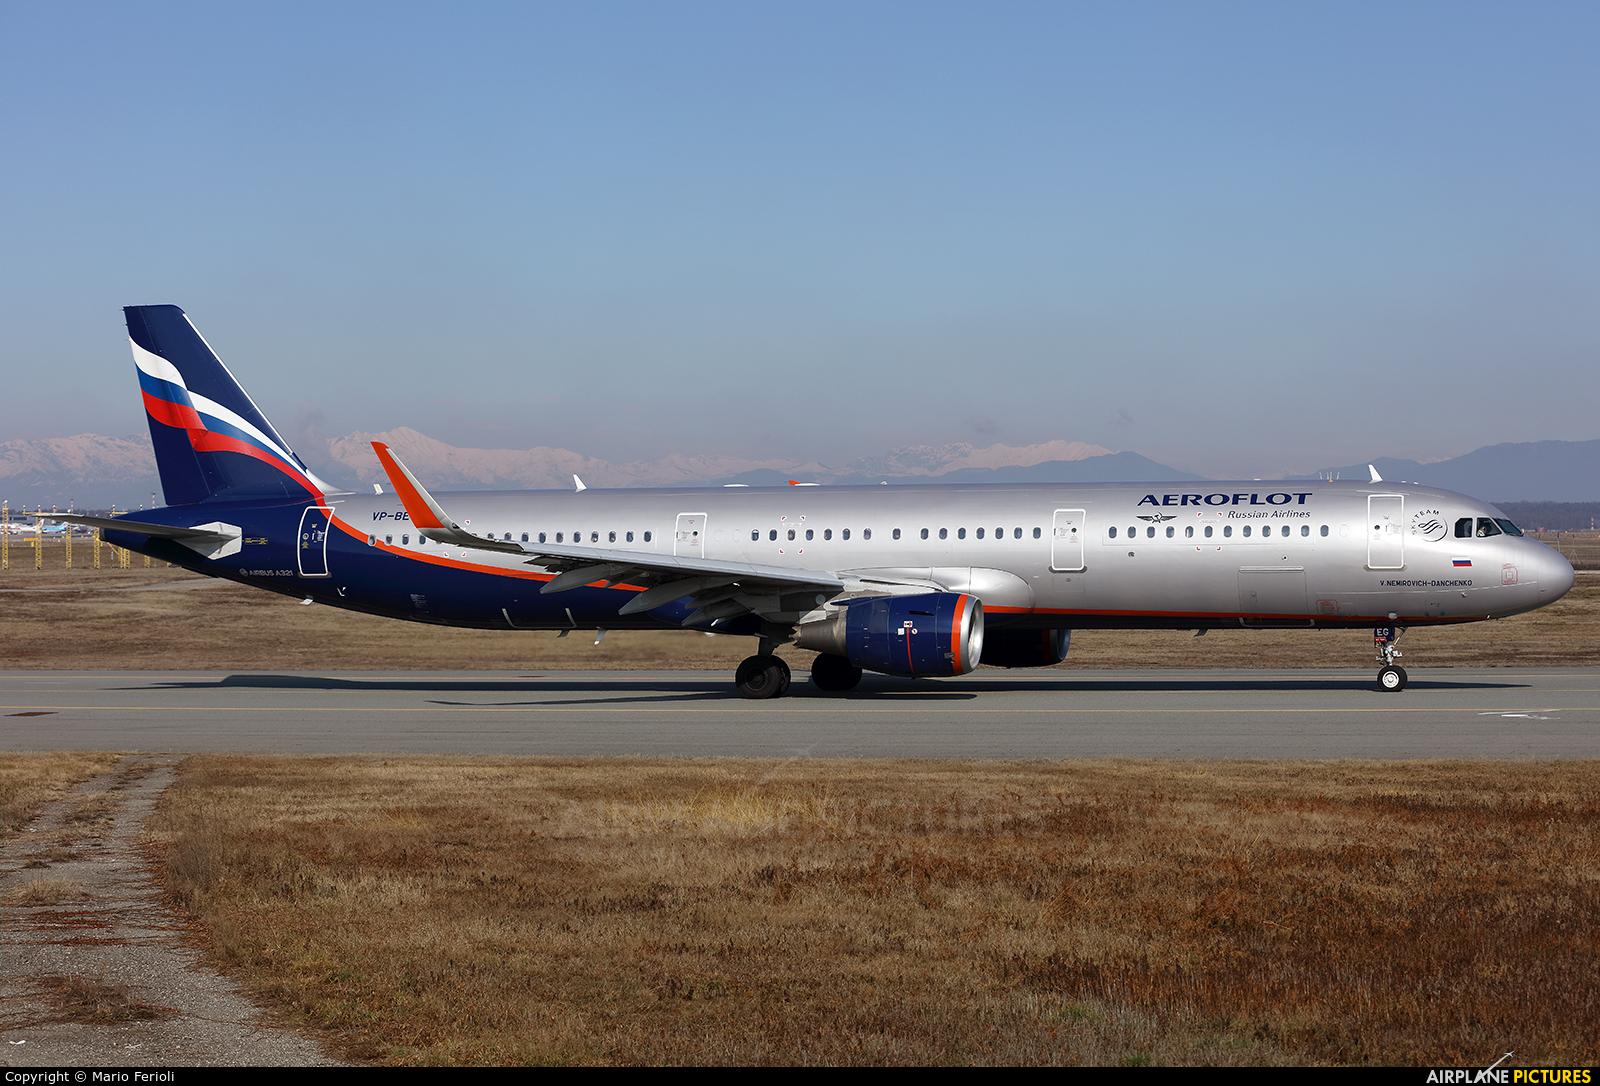 Aeroflot VP-BEG aircraft at Milan - Malpensa